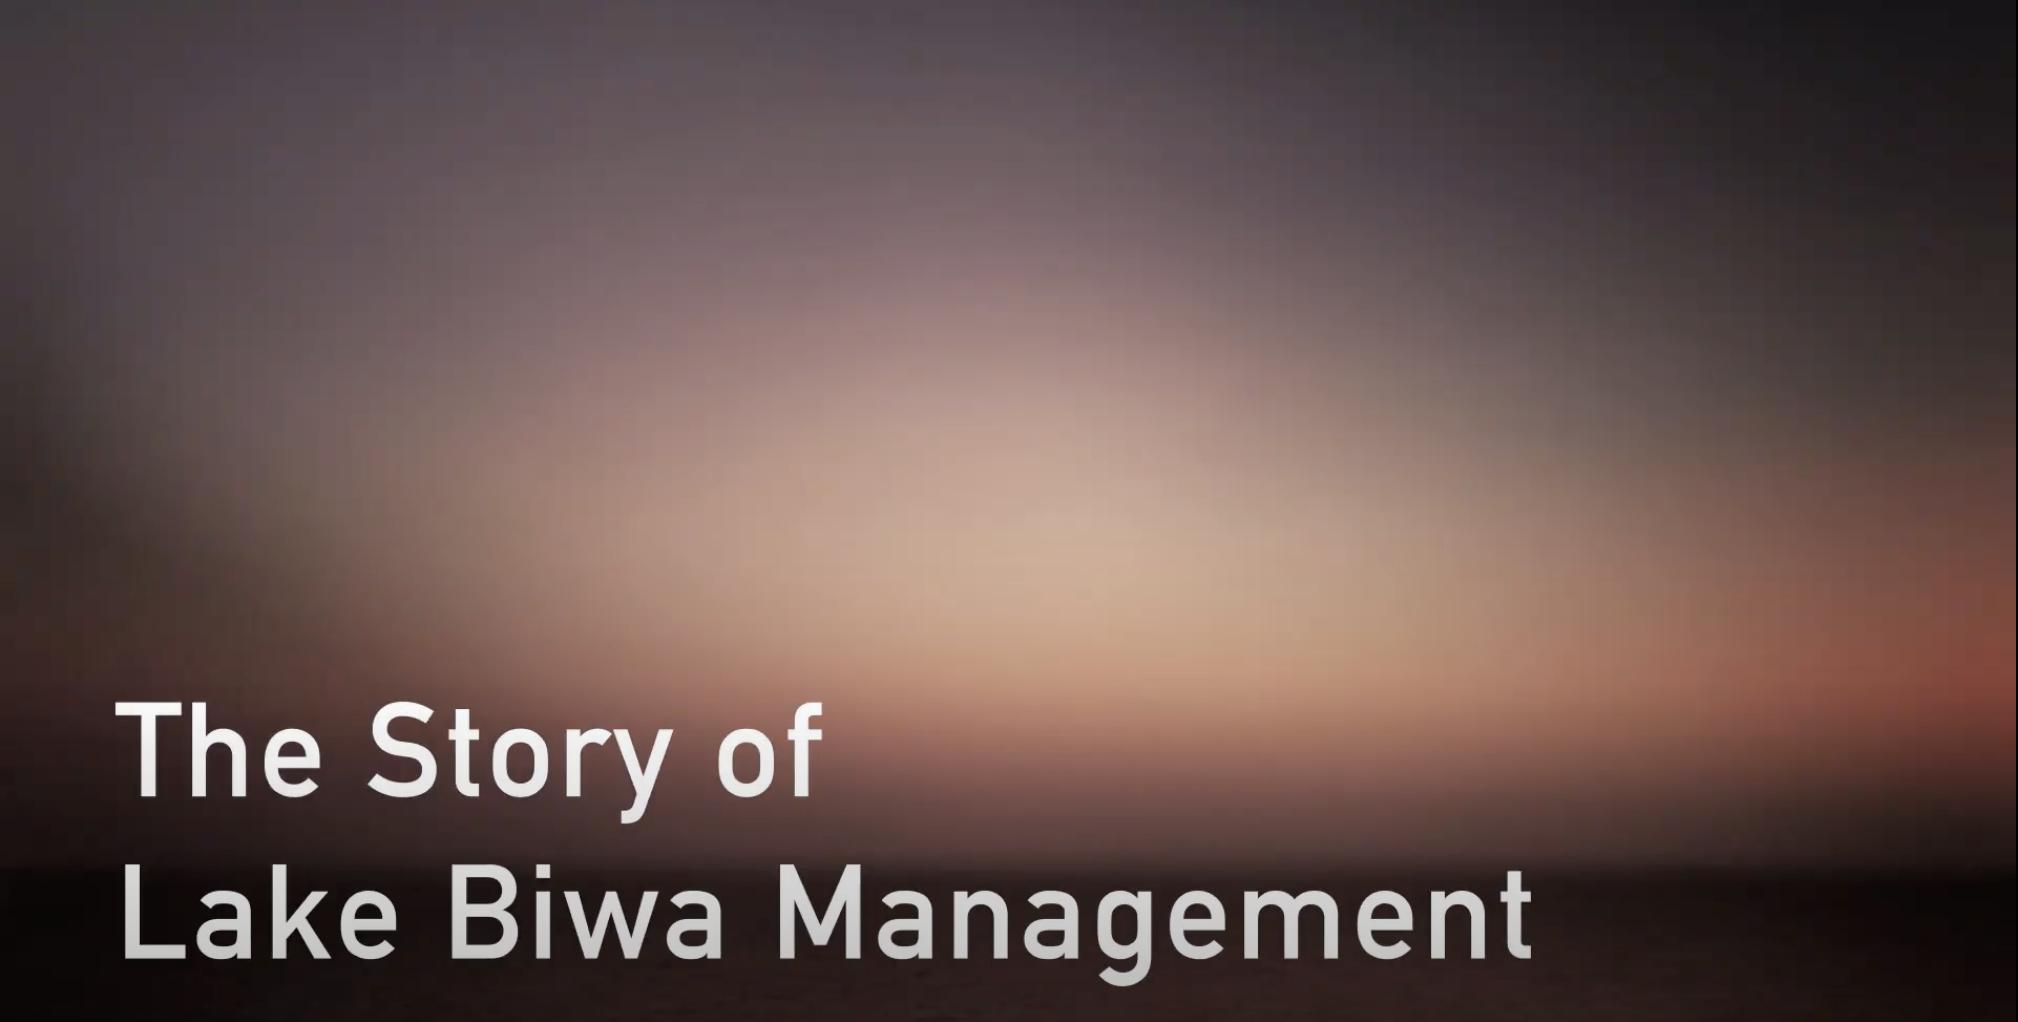 ILEC The story of Lake Biwa Management | Video